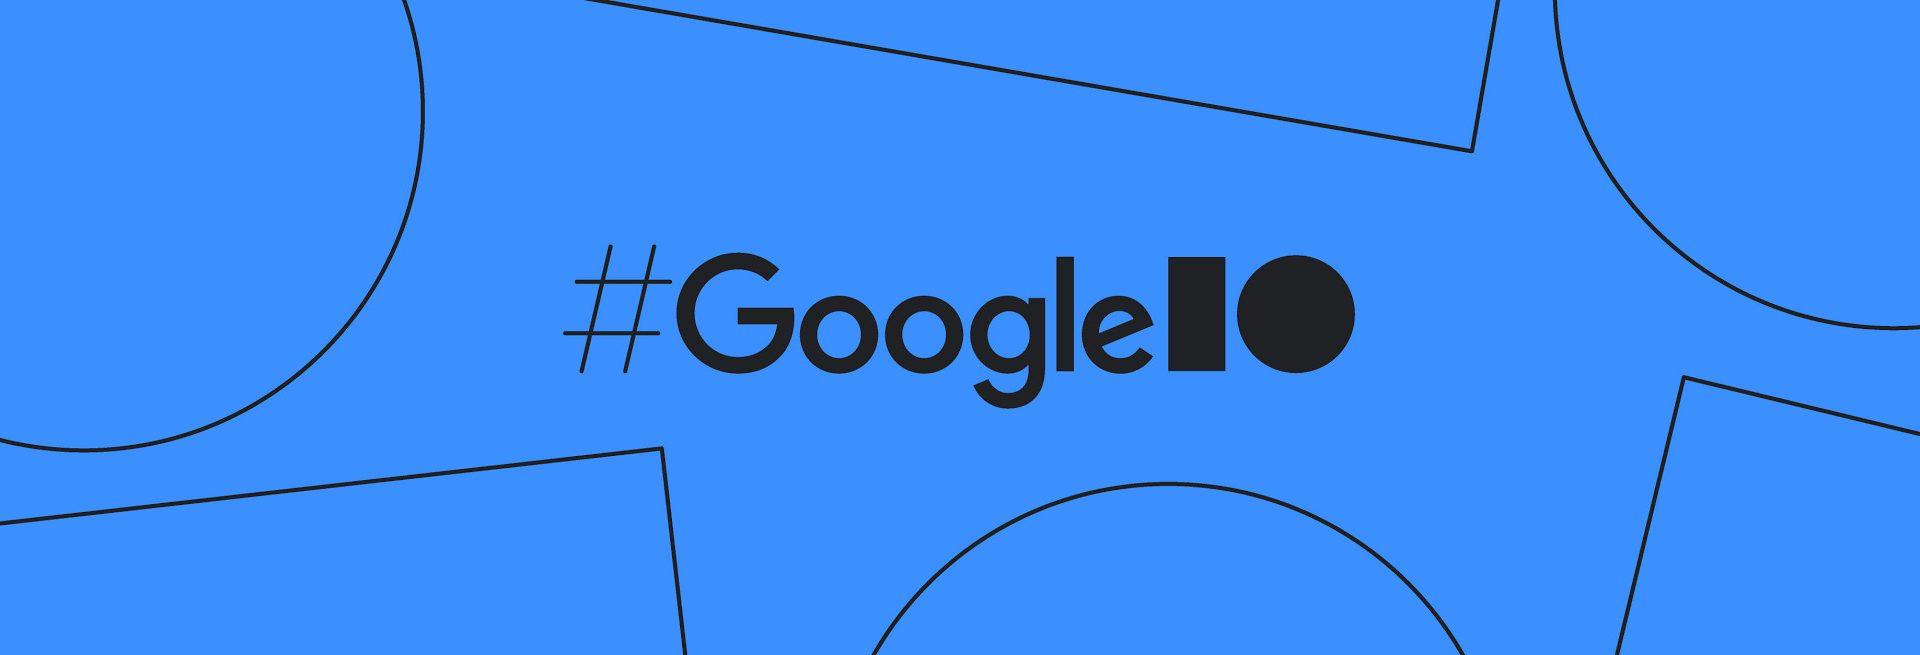 Google Cloud | IO